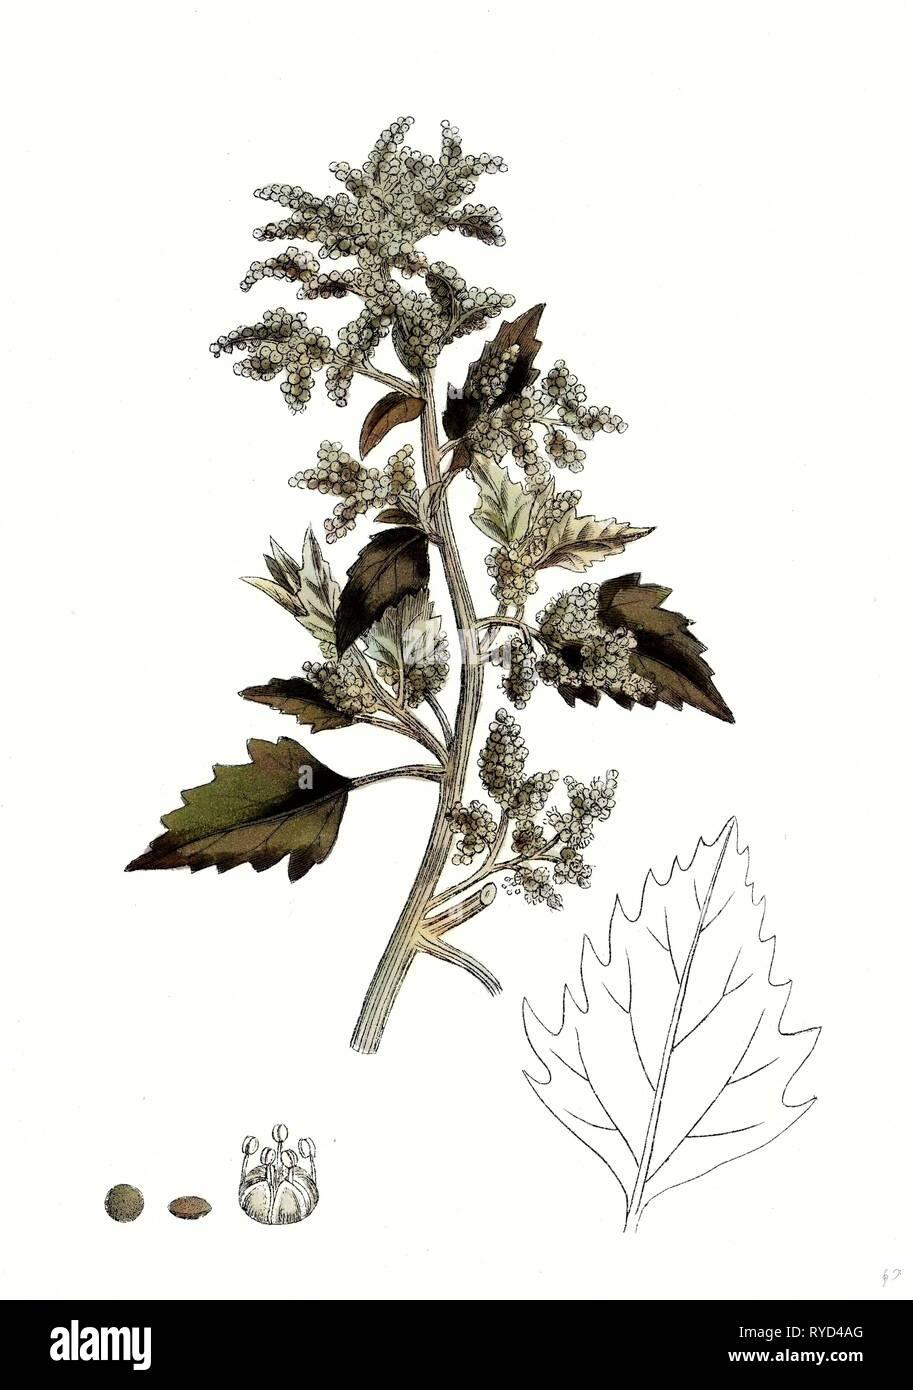 Chenopodium Murale Nettle-Leaved Goosefoot - Stock Image